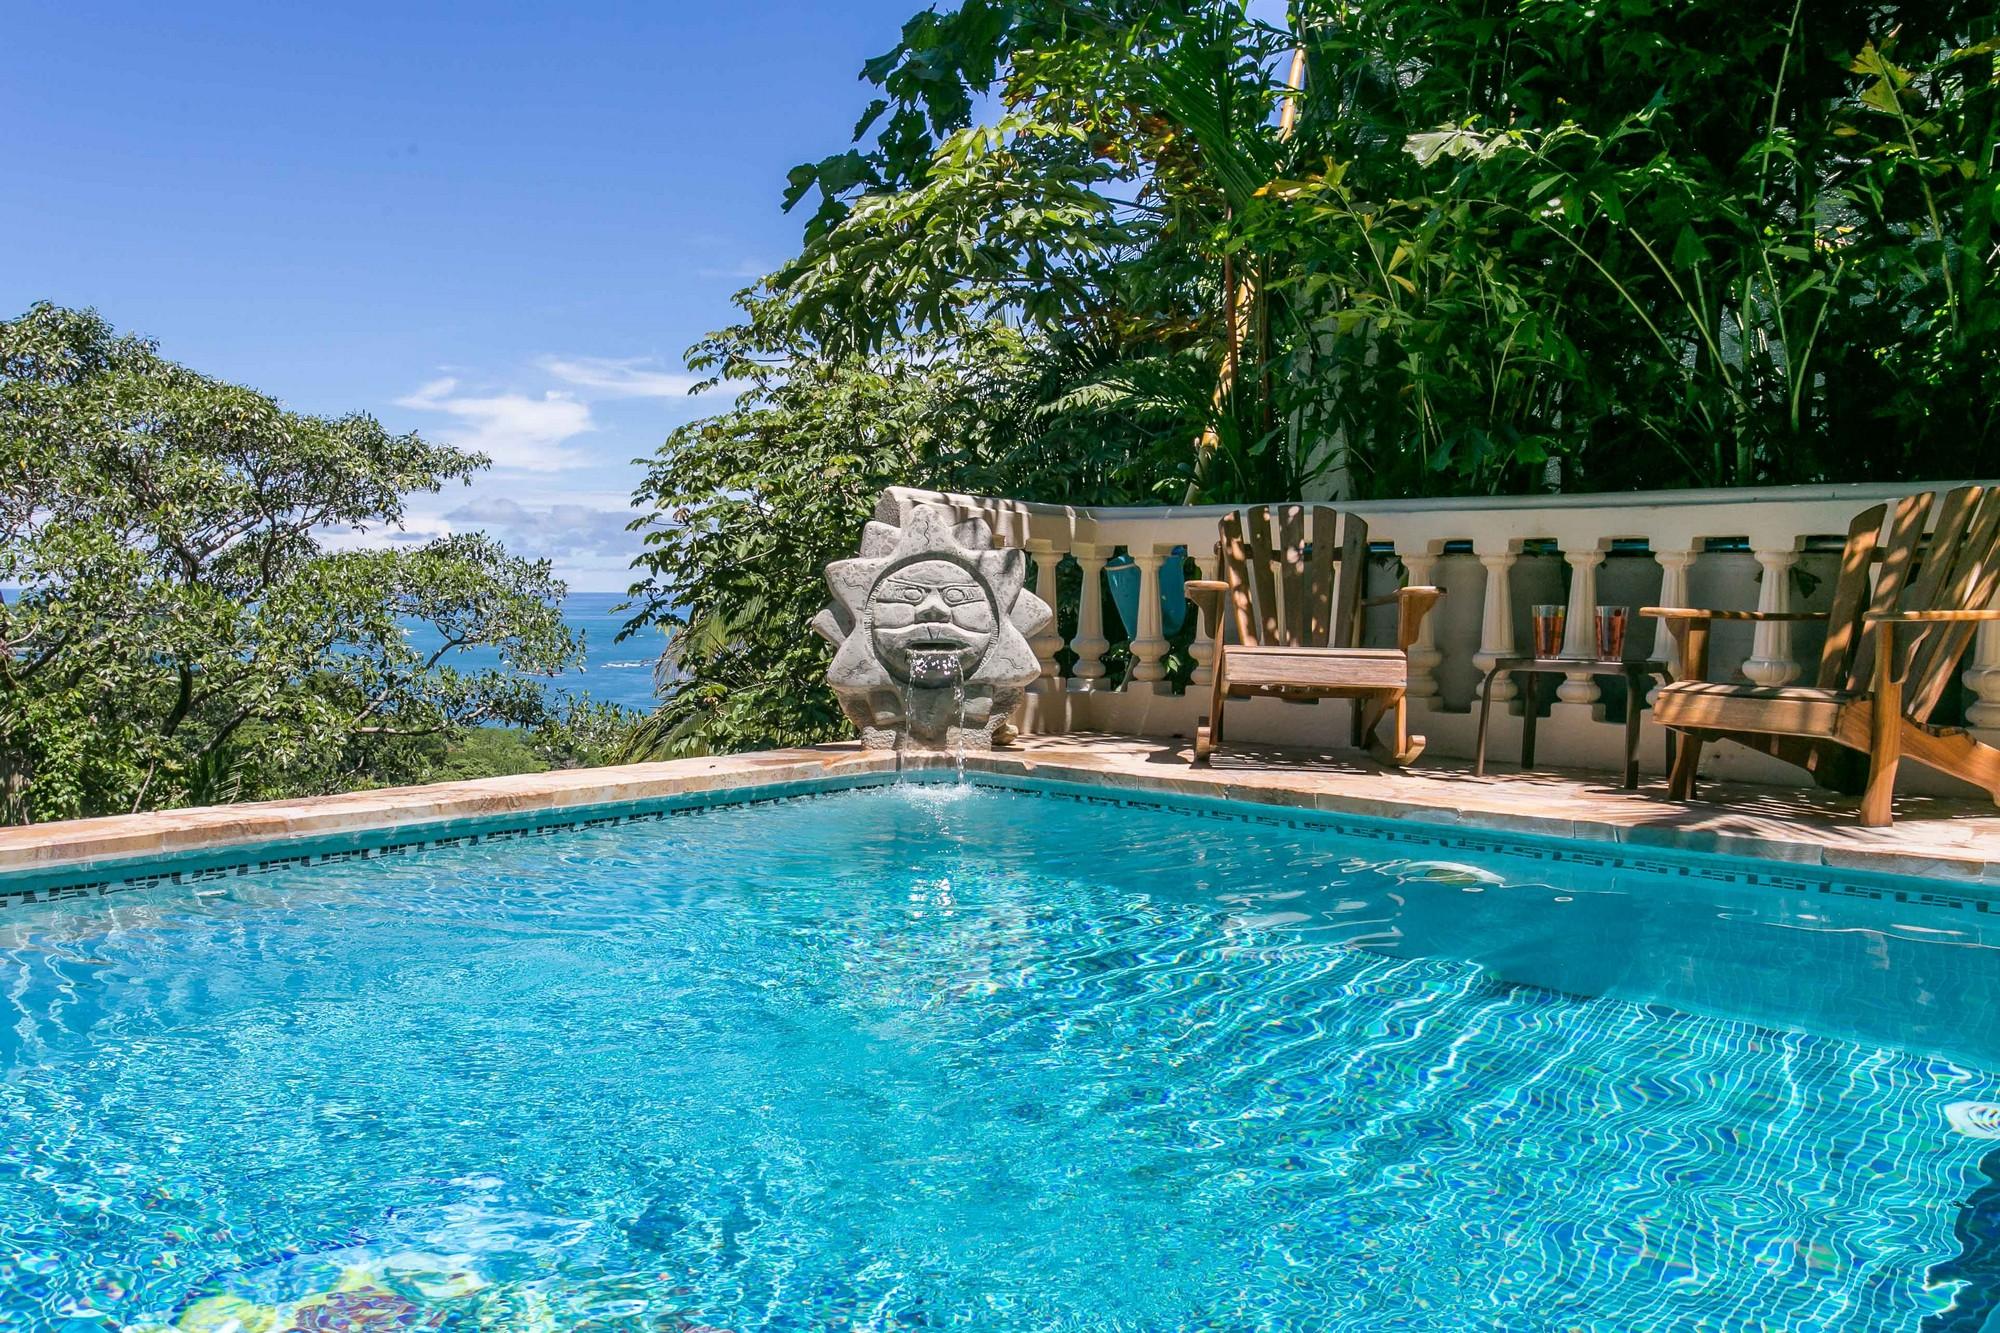 Kastytis Kourt, Manuel Antonio, Costa Rica Huge pool, fit for laps!